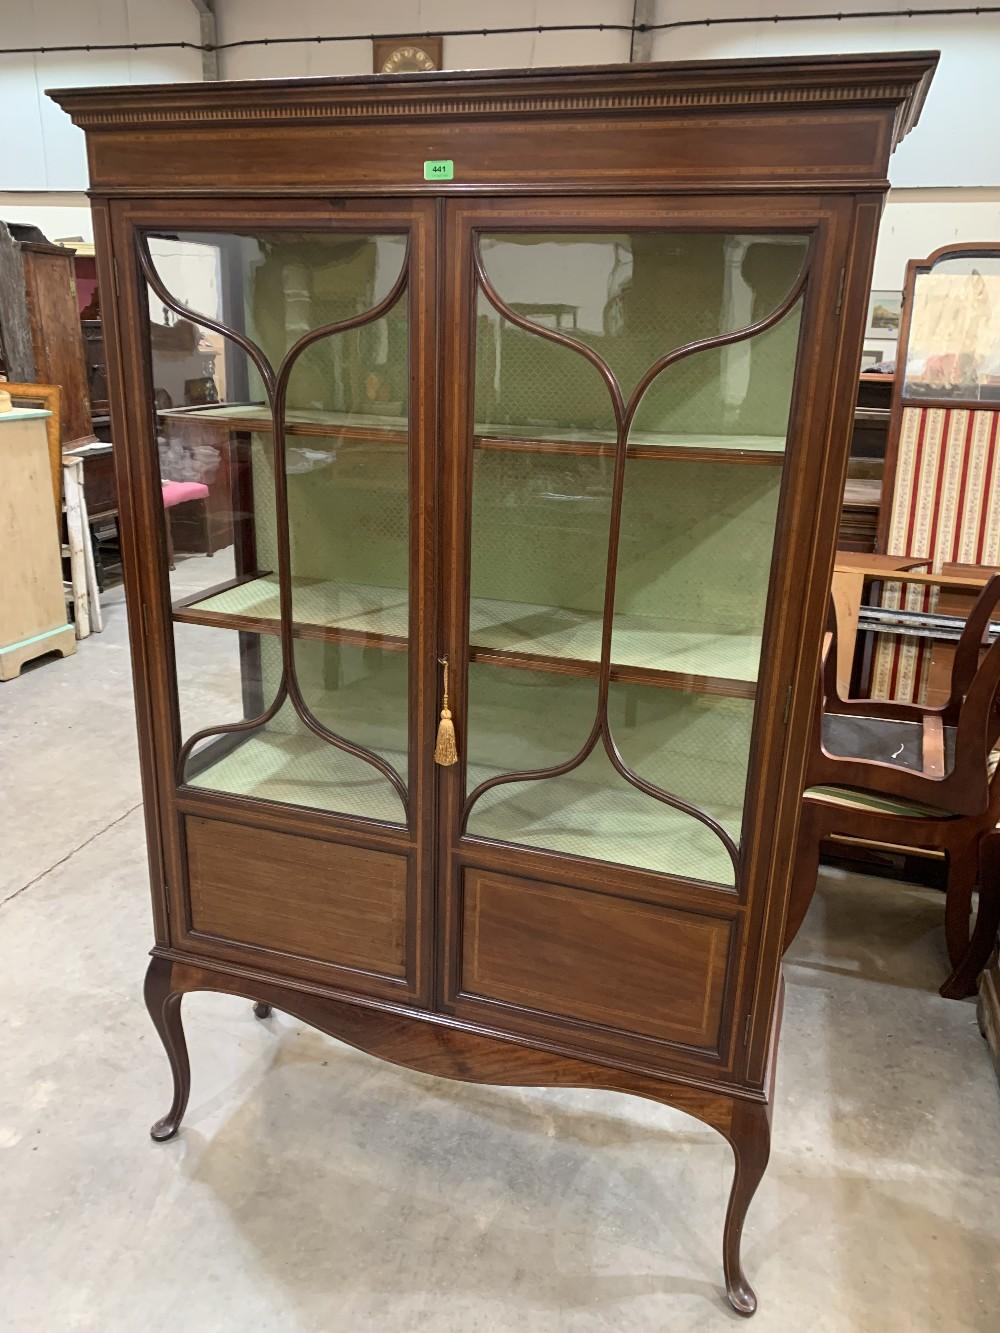 An Edward VII mahogany china display cabinet, line inlaid and satinwood banded, enclosed by a pair